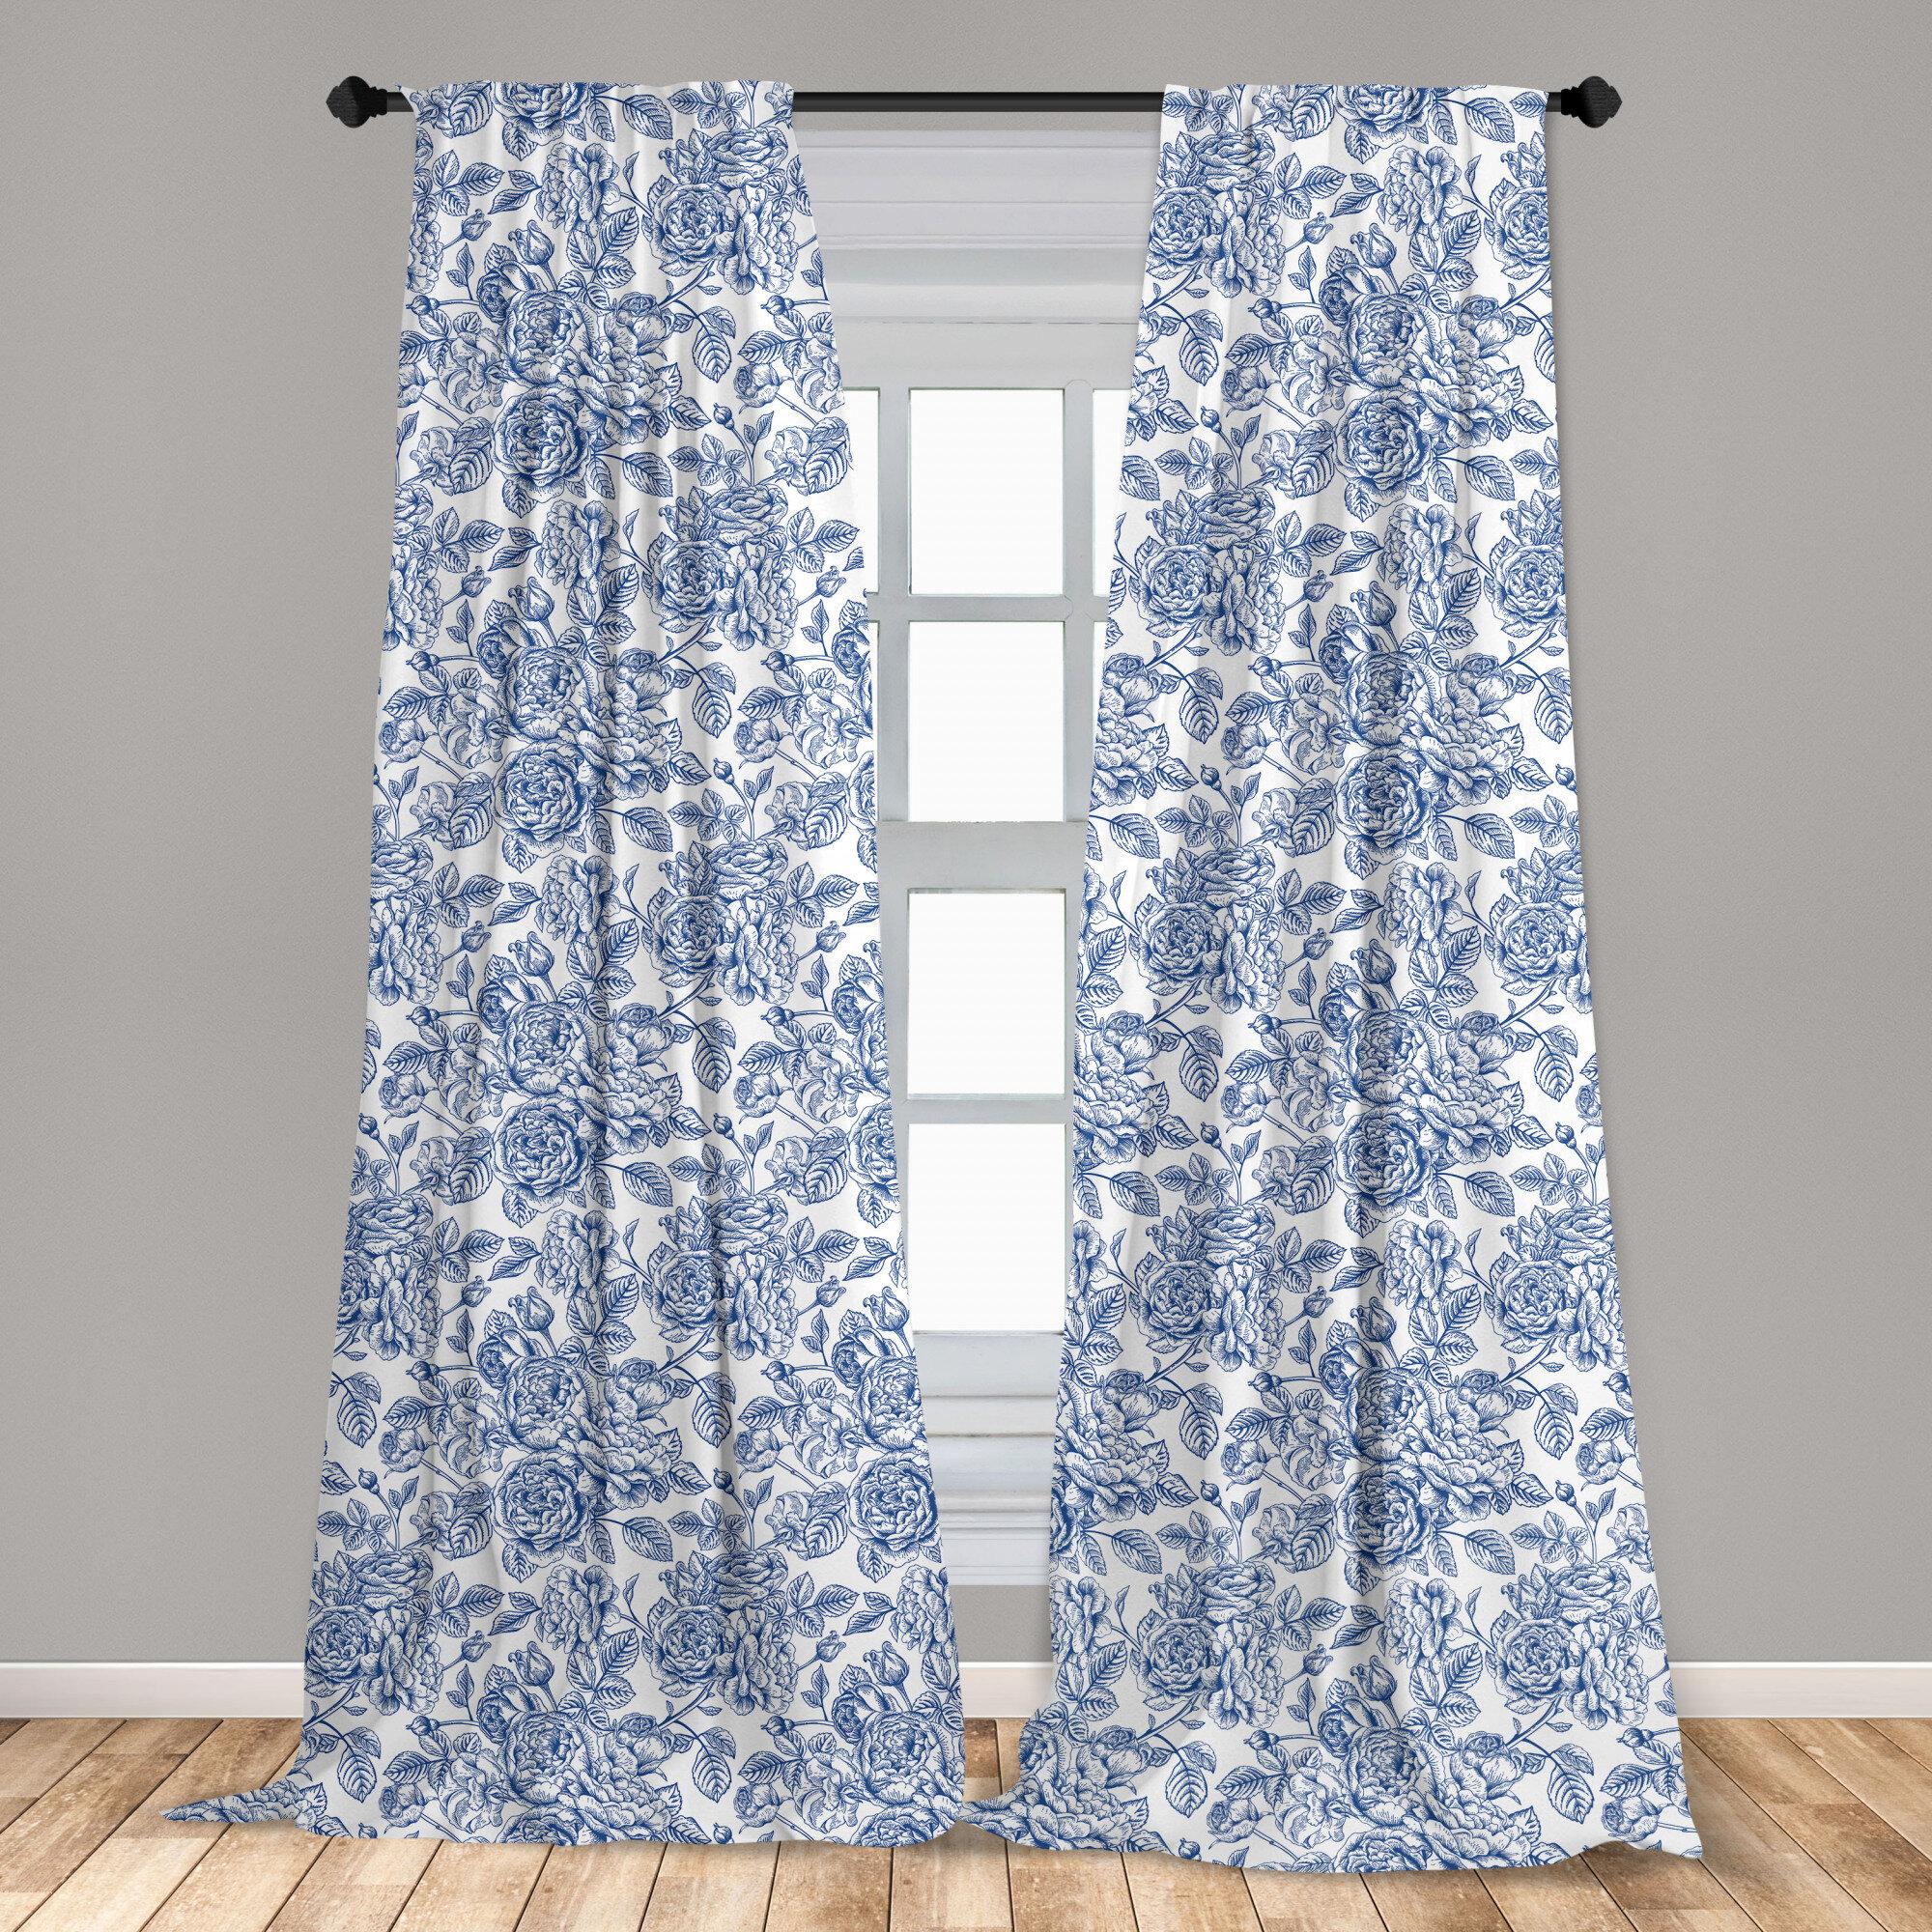 East Urban Home Rose Floral Room Darkening Rod Pocket Curtain Panels Reviews Wayfair